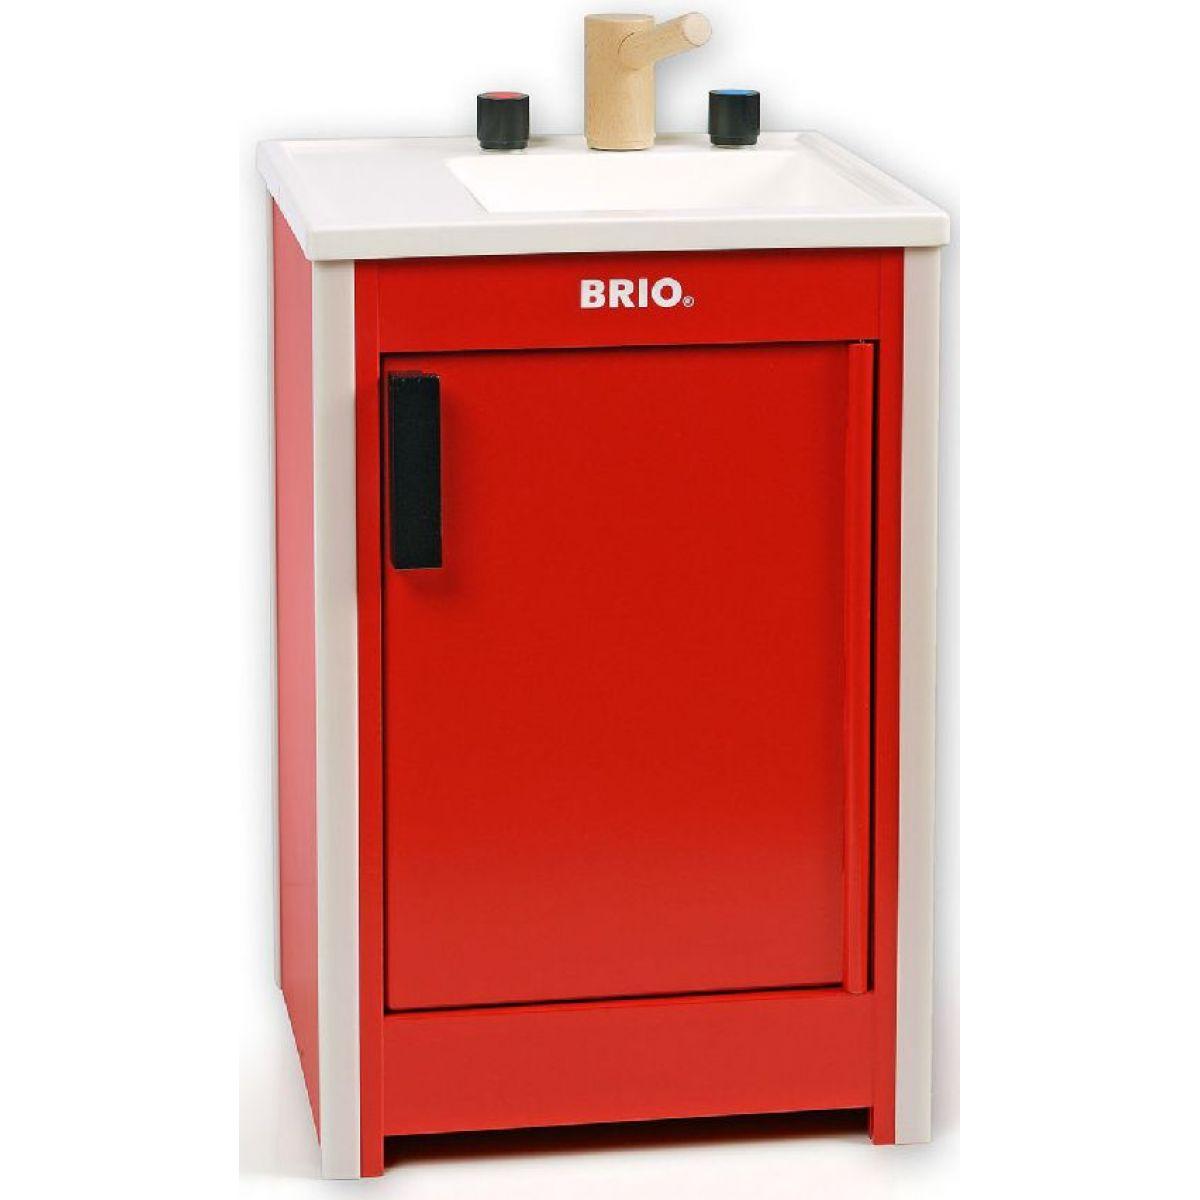 Brio Kuchyňský dřez Červený